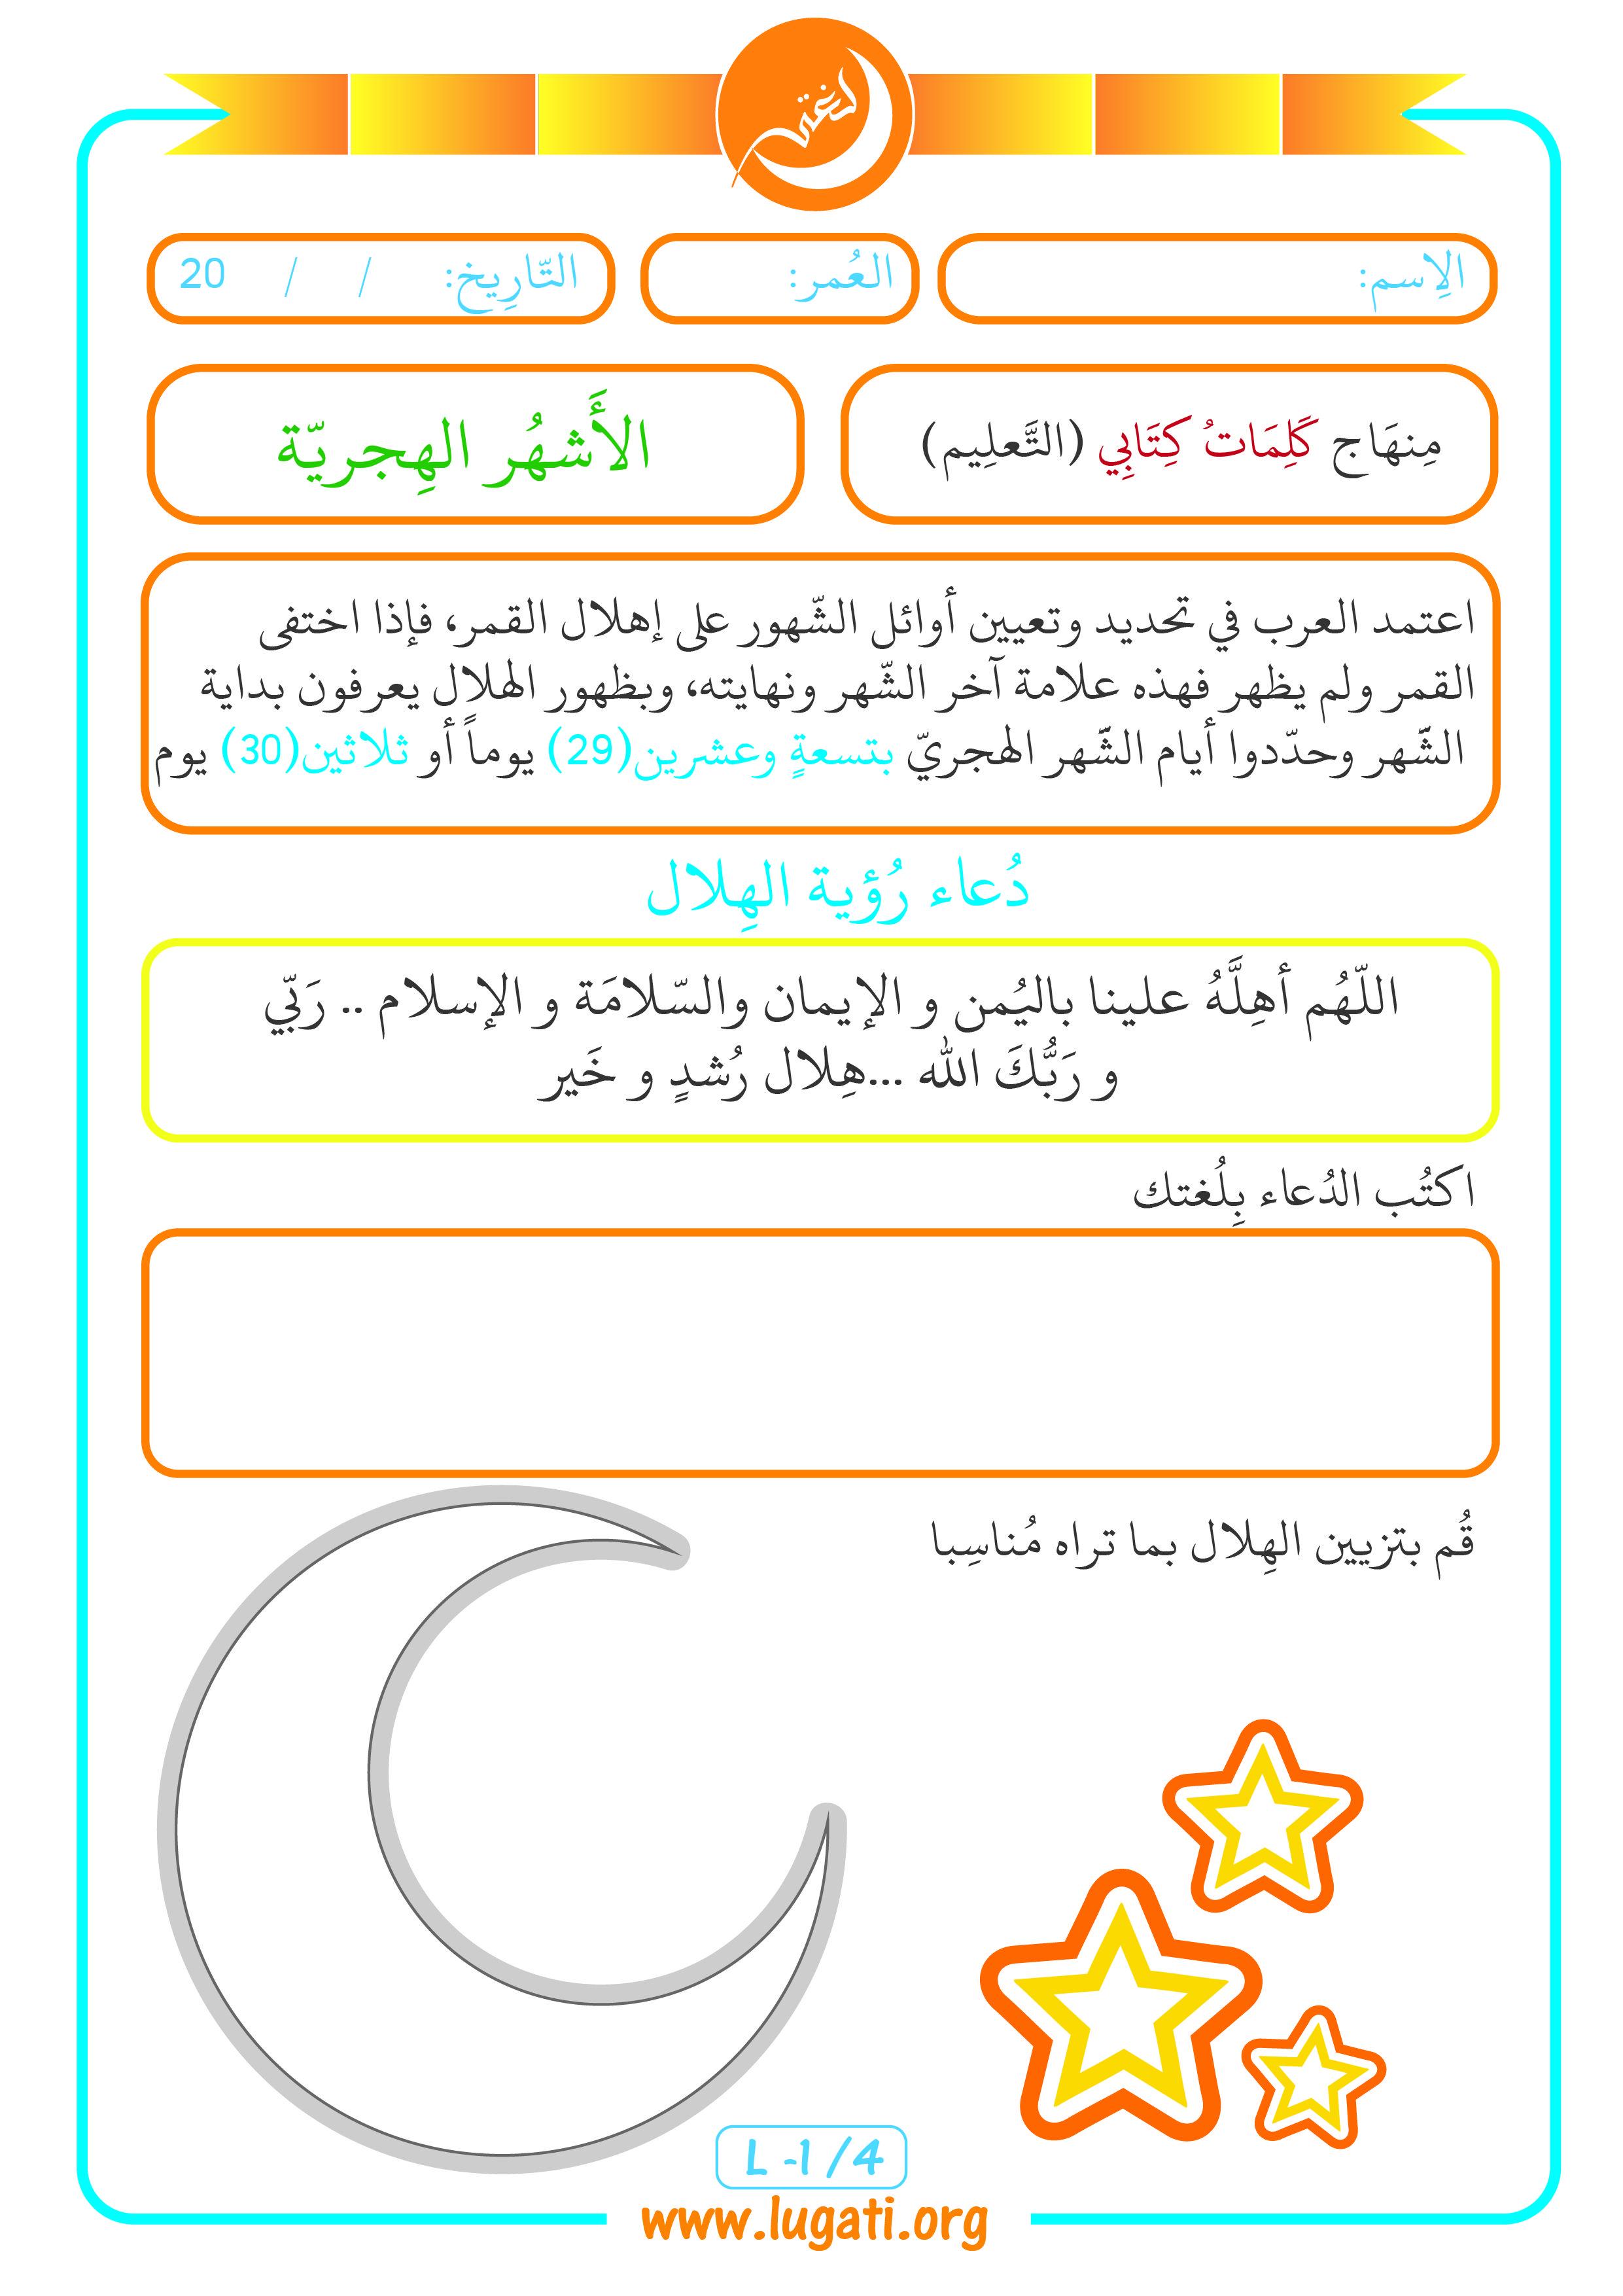 Hijri Months L1 Arabic Alphabet For Kids Hijri Months Islamic Kids Activities